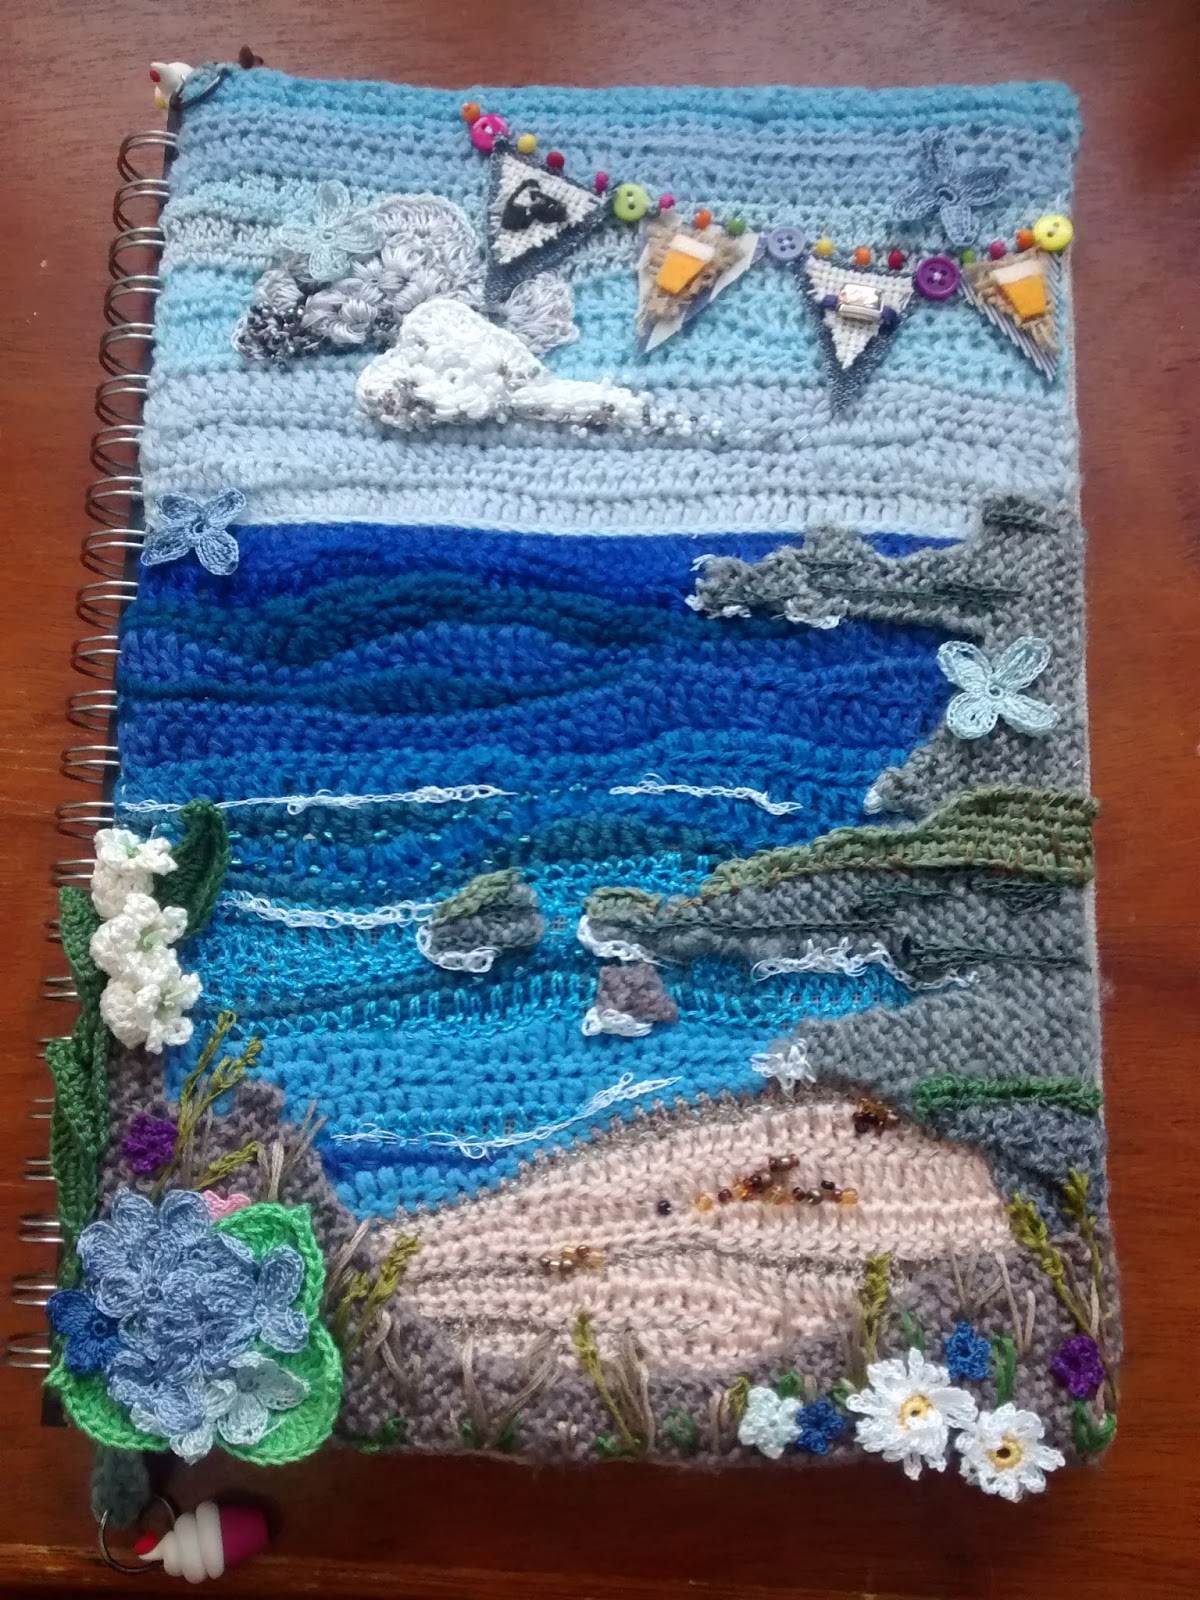 String Theory Crochet Mostly Crochet Freeform Seascape